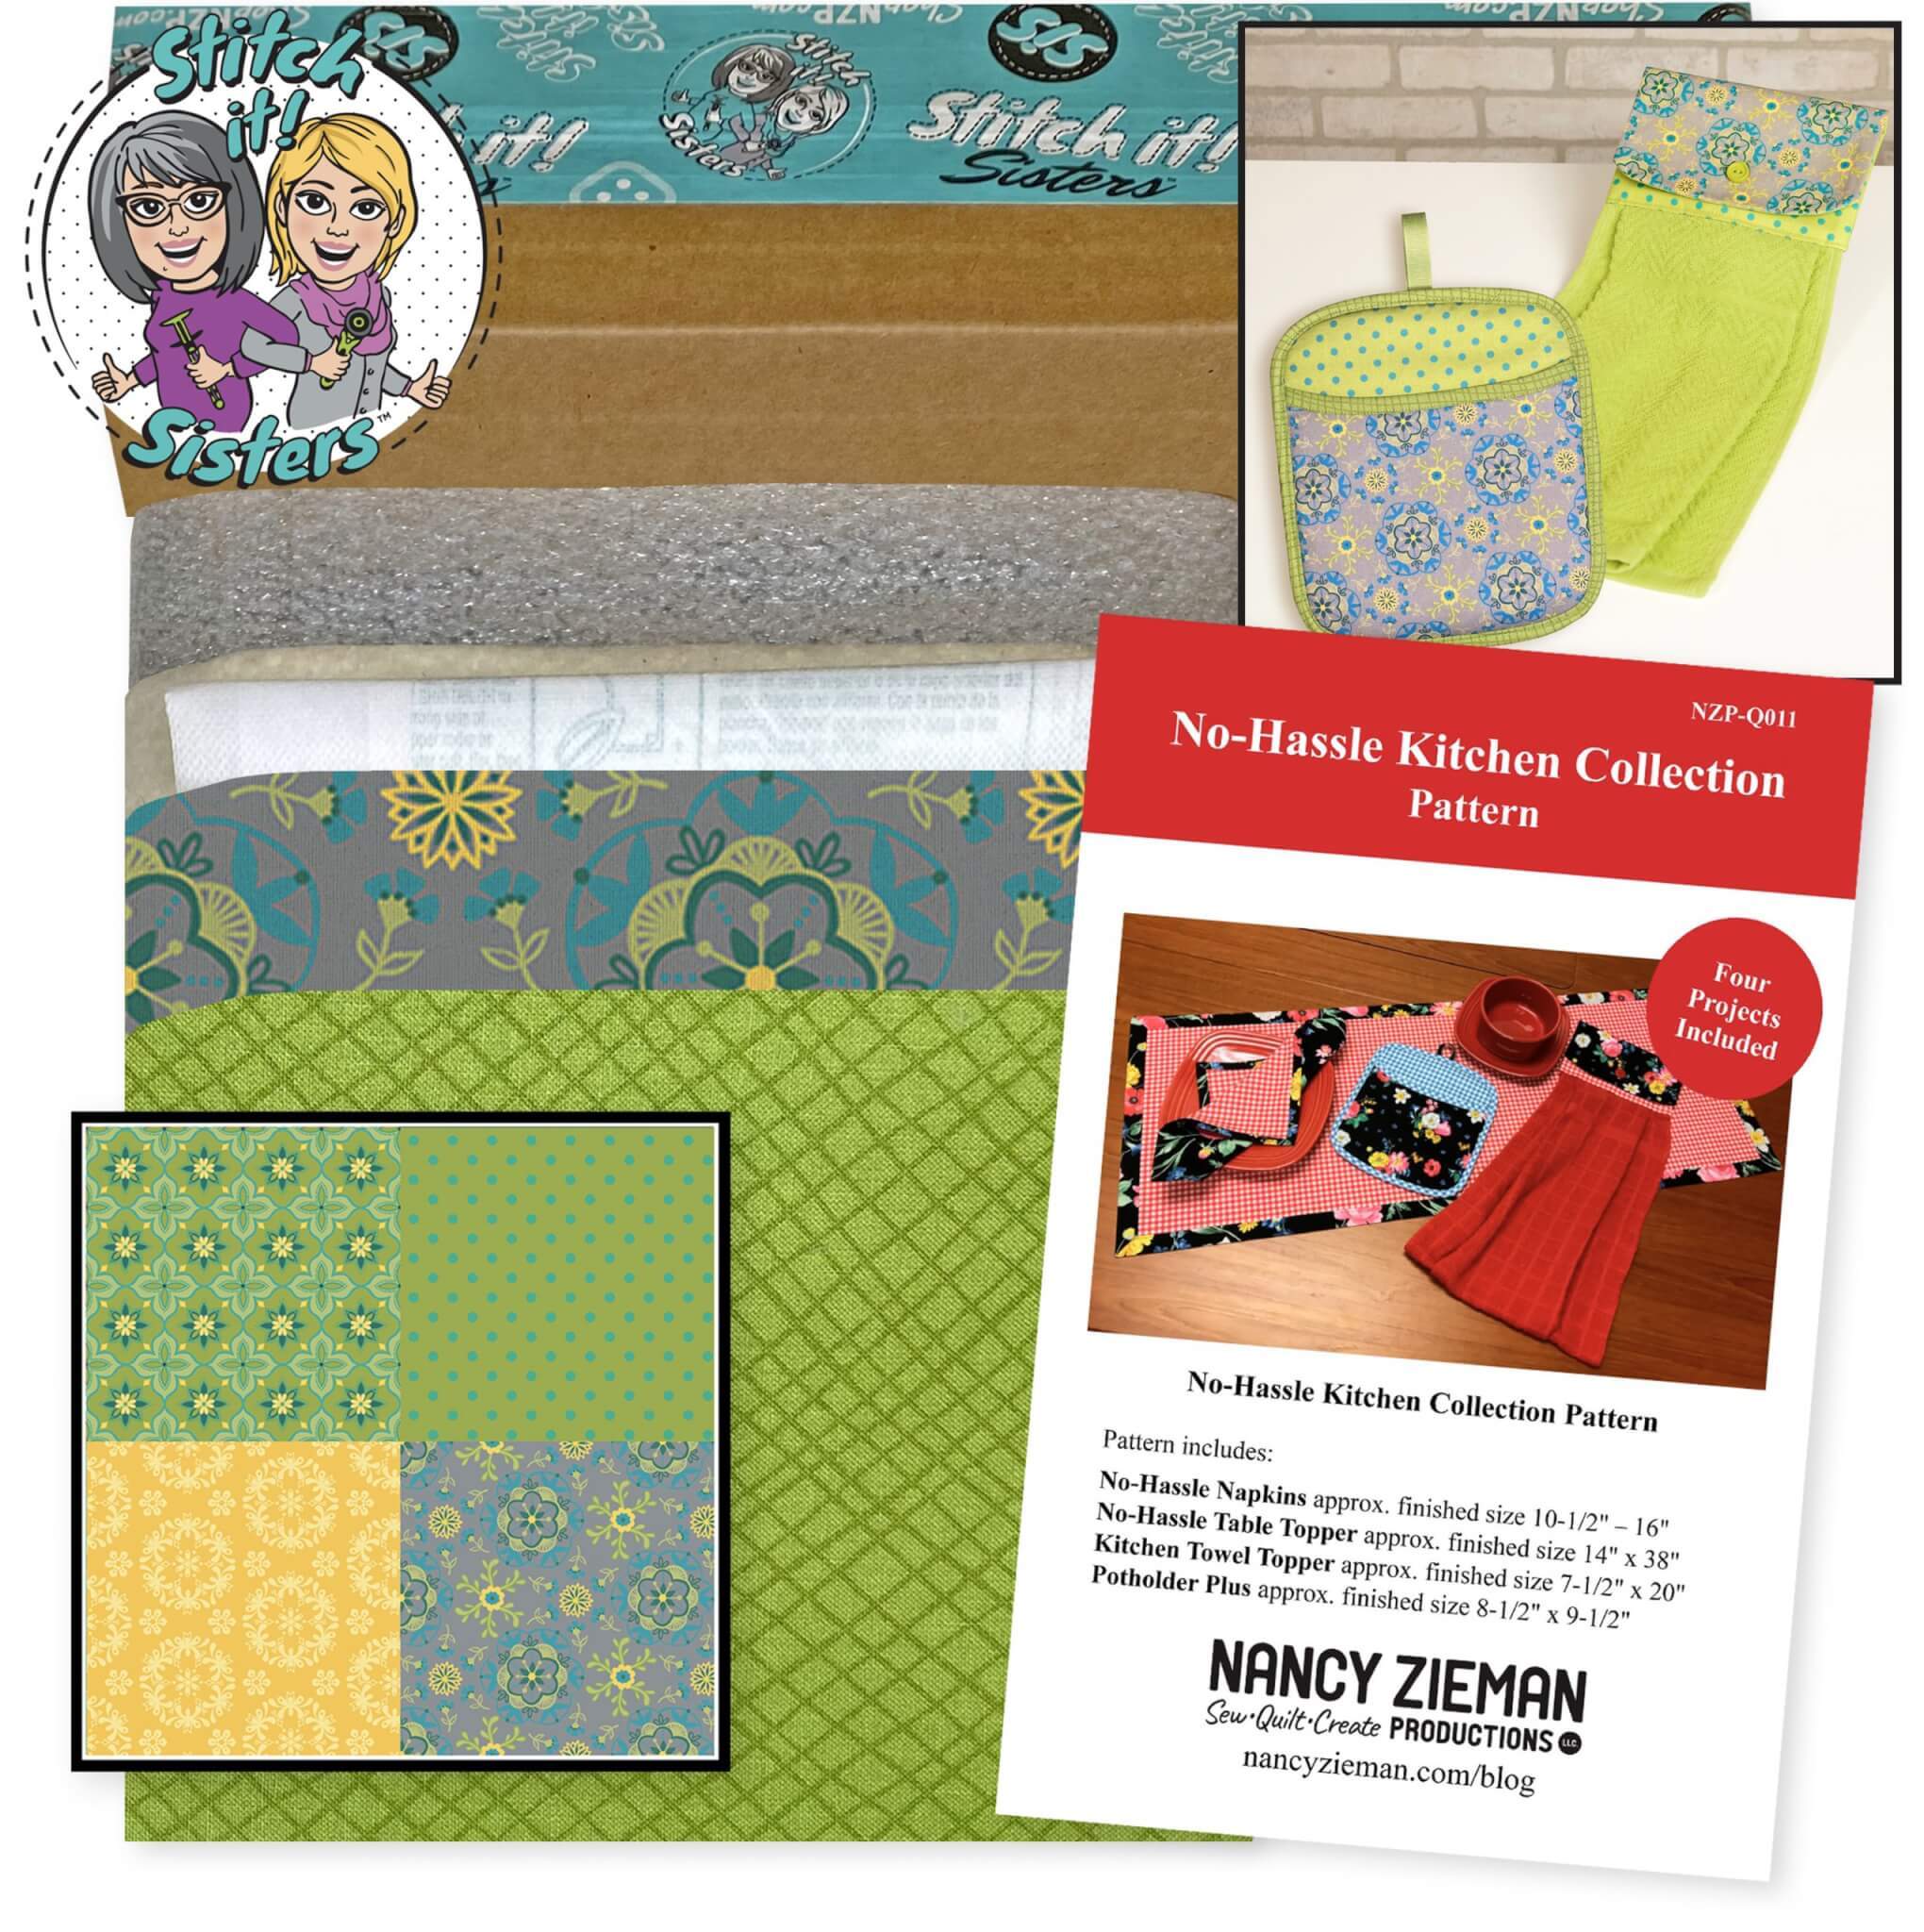 Wildflower Boutique Potholder Plus and Towel Topper Bundle Box available at Nancy Zieman Productions at ShopNZP.com